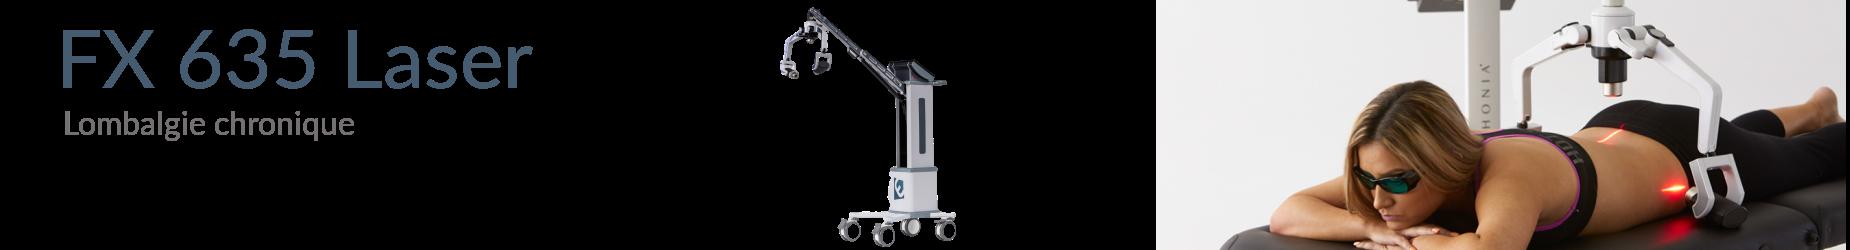 Erchonia FX 635 laser